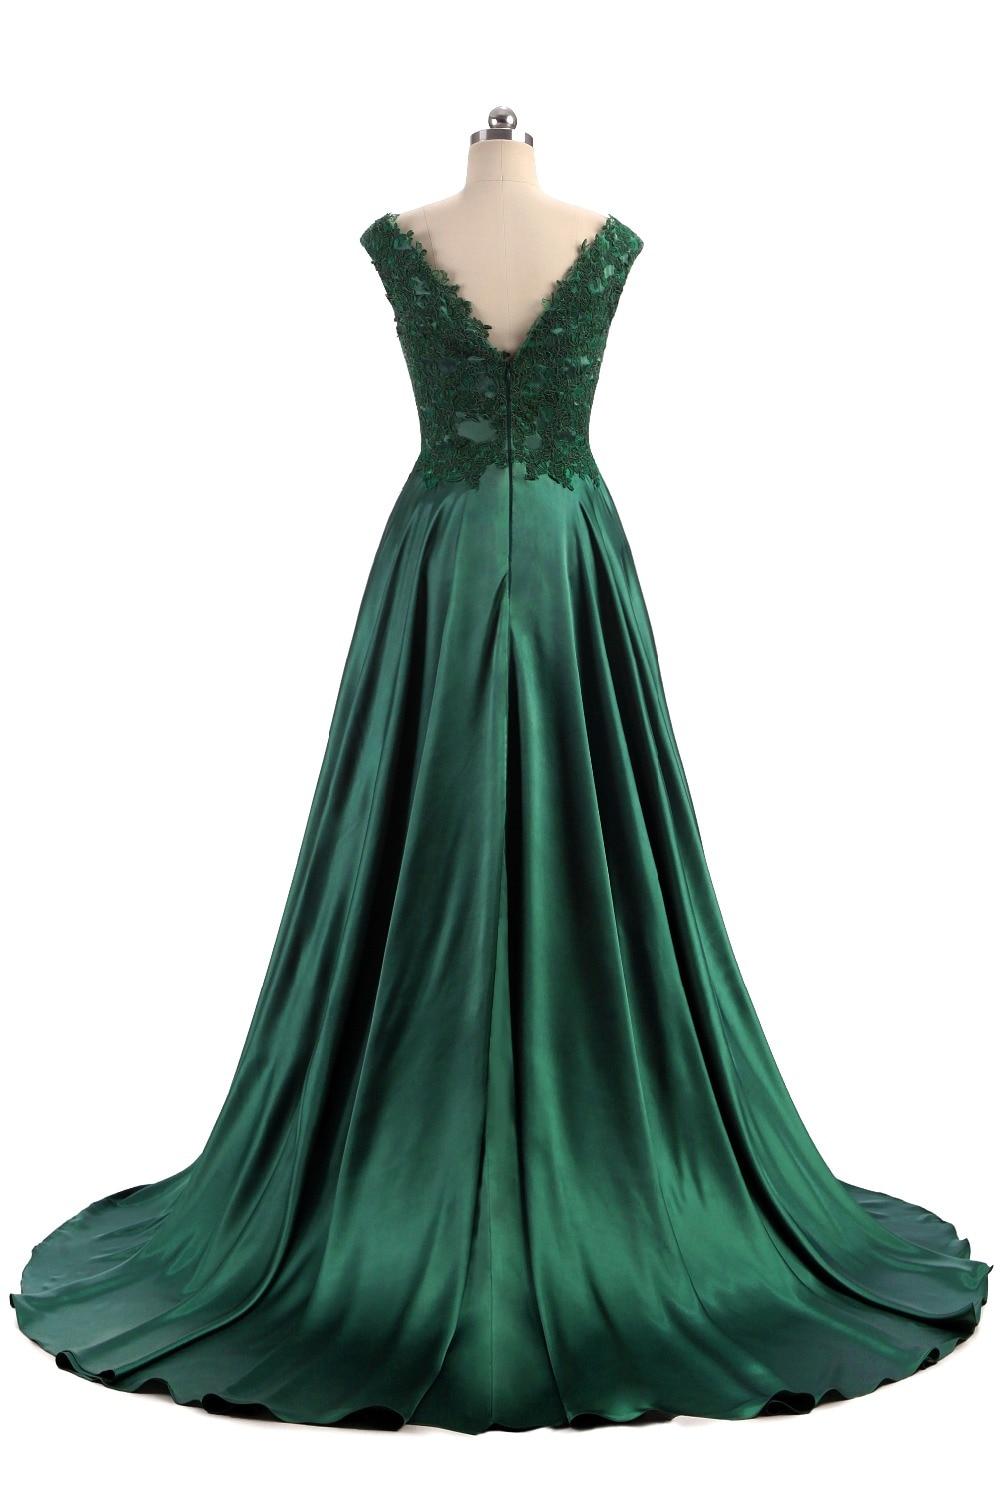 Elie Saab βραδυνό φόρεμα μακρύ για γάμο - Ειδικές φορέματα περίπτωσης - Φωτογραφία 2